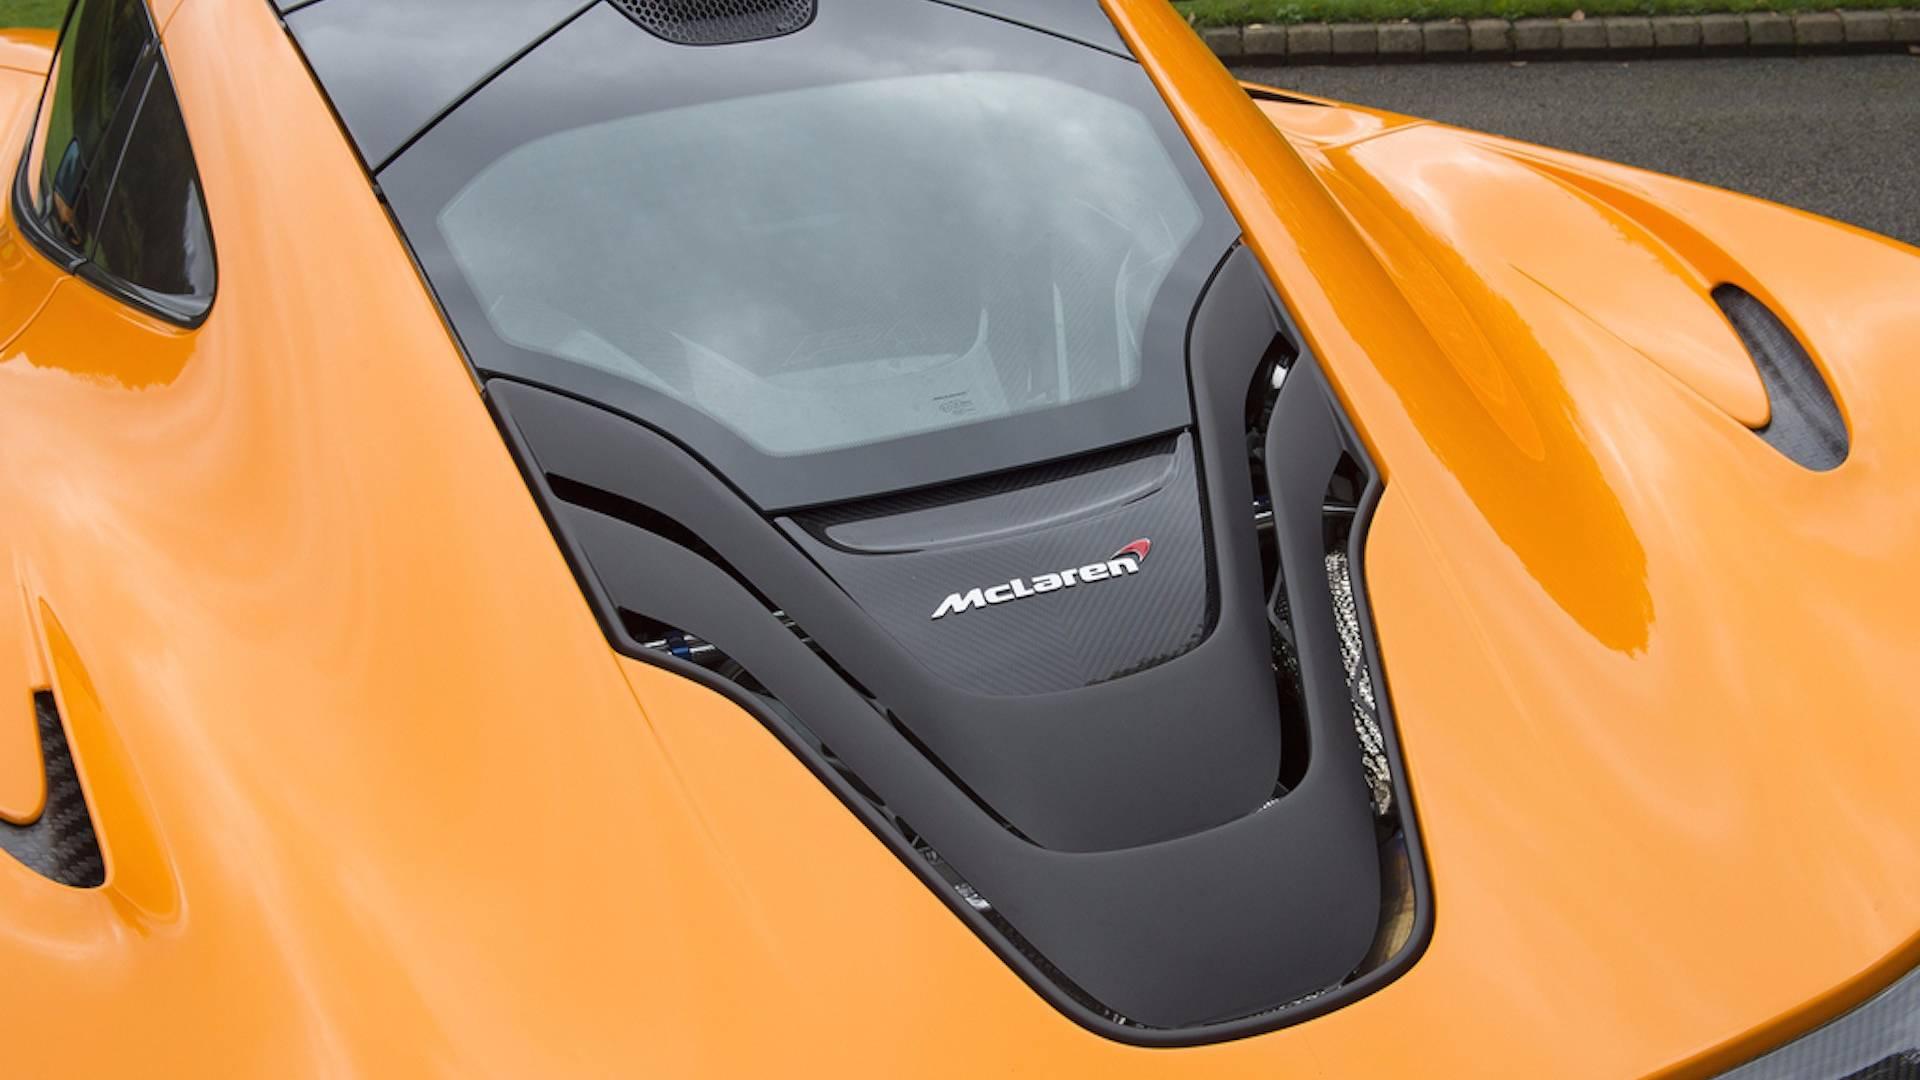 McLaren_P1_Experimental_Prototype_26